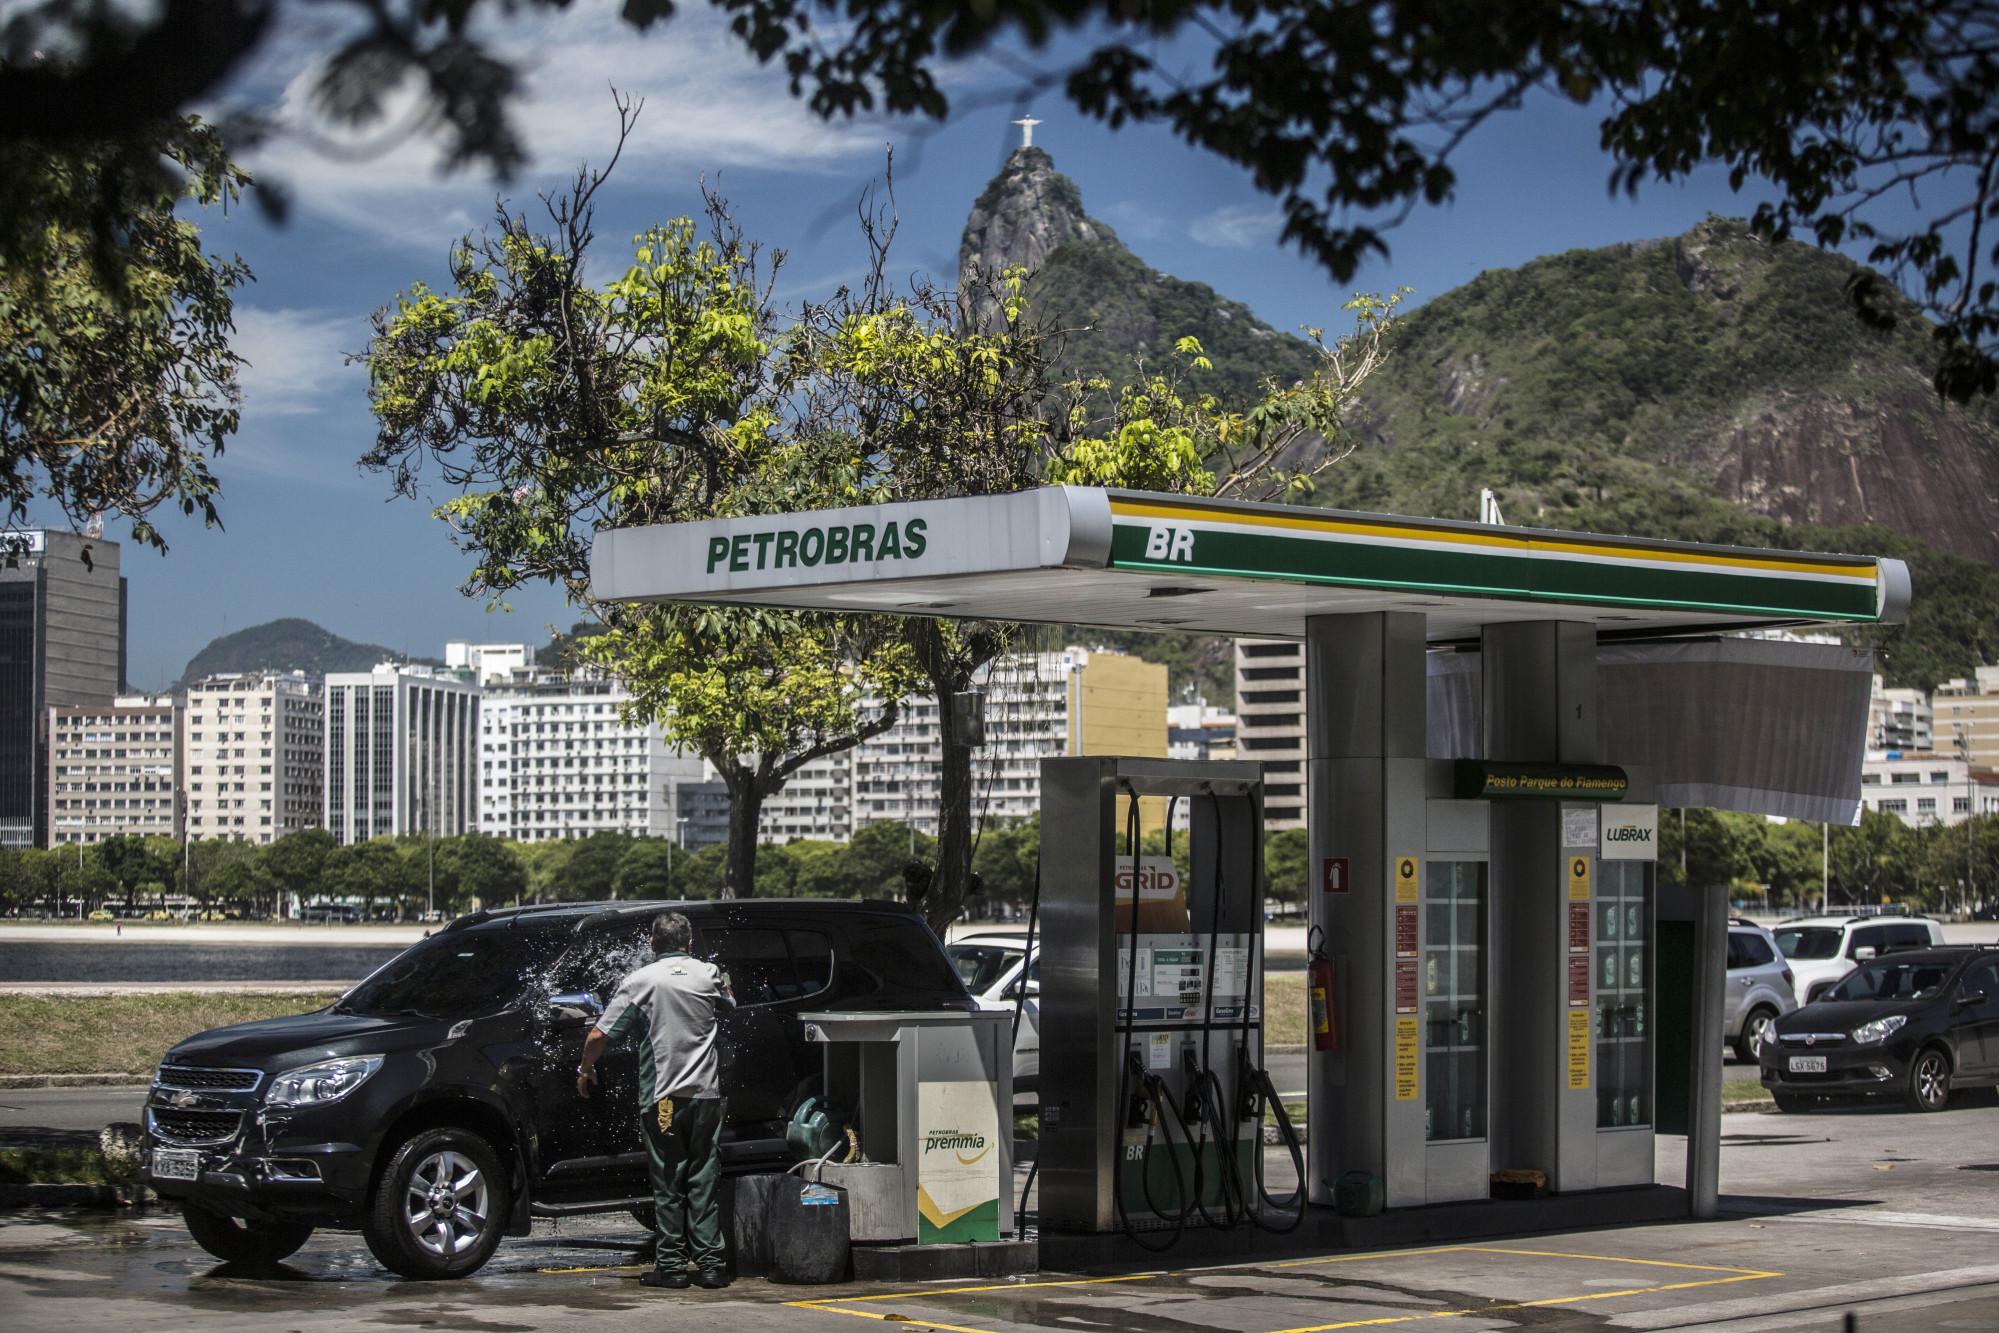 An attendant washes a car at a Petroleo Brasileiro SA (Petrobras) gas station in Rio de Janeiro, Brazil, on Friday, Nov. 10, 2017. Petroleo Brasileiro SA is scheduled to release earnings figures on November 13. Photographer: Dado Galdieri/Bloomberg